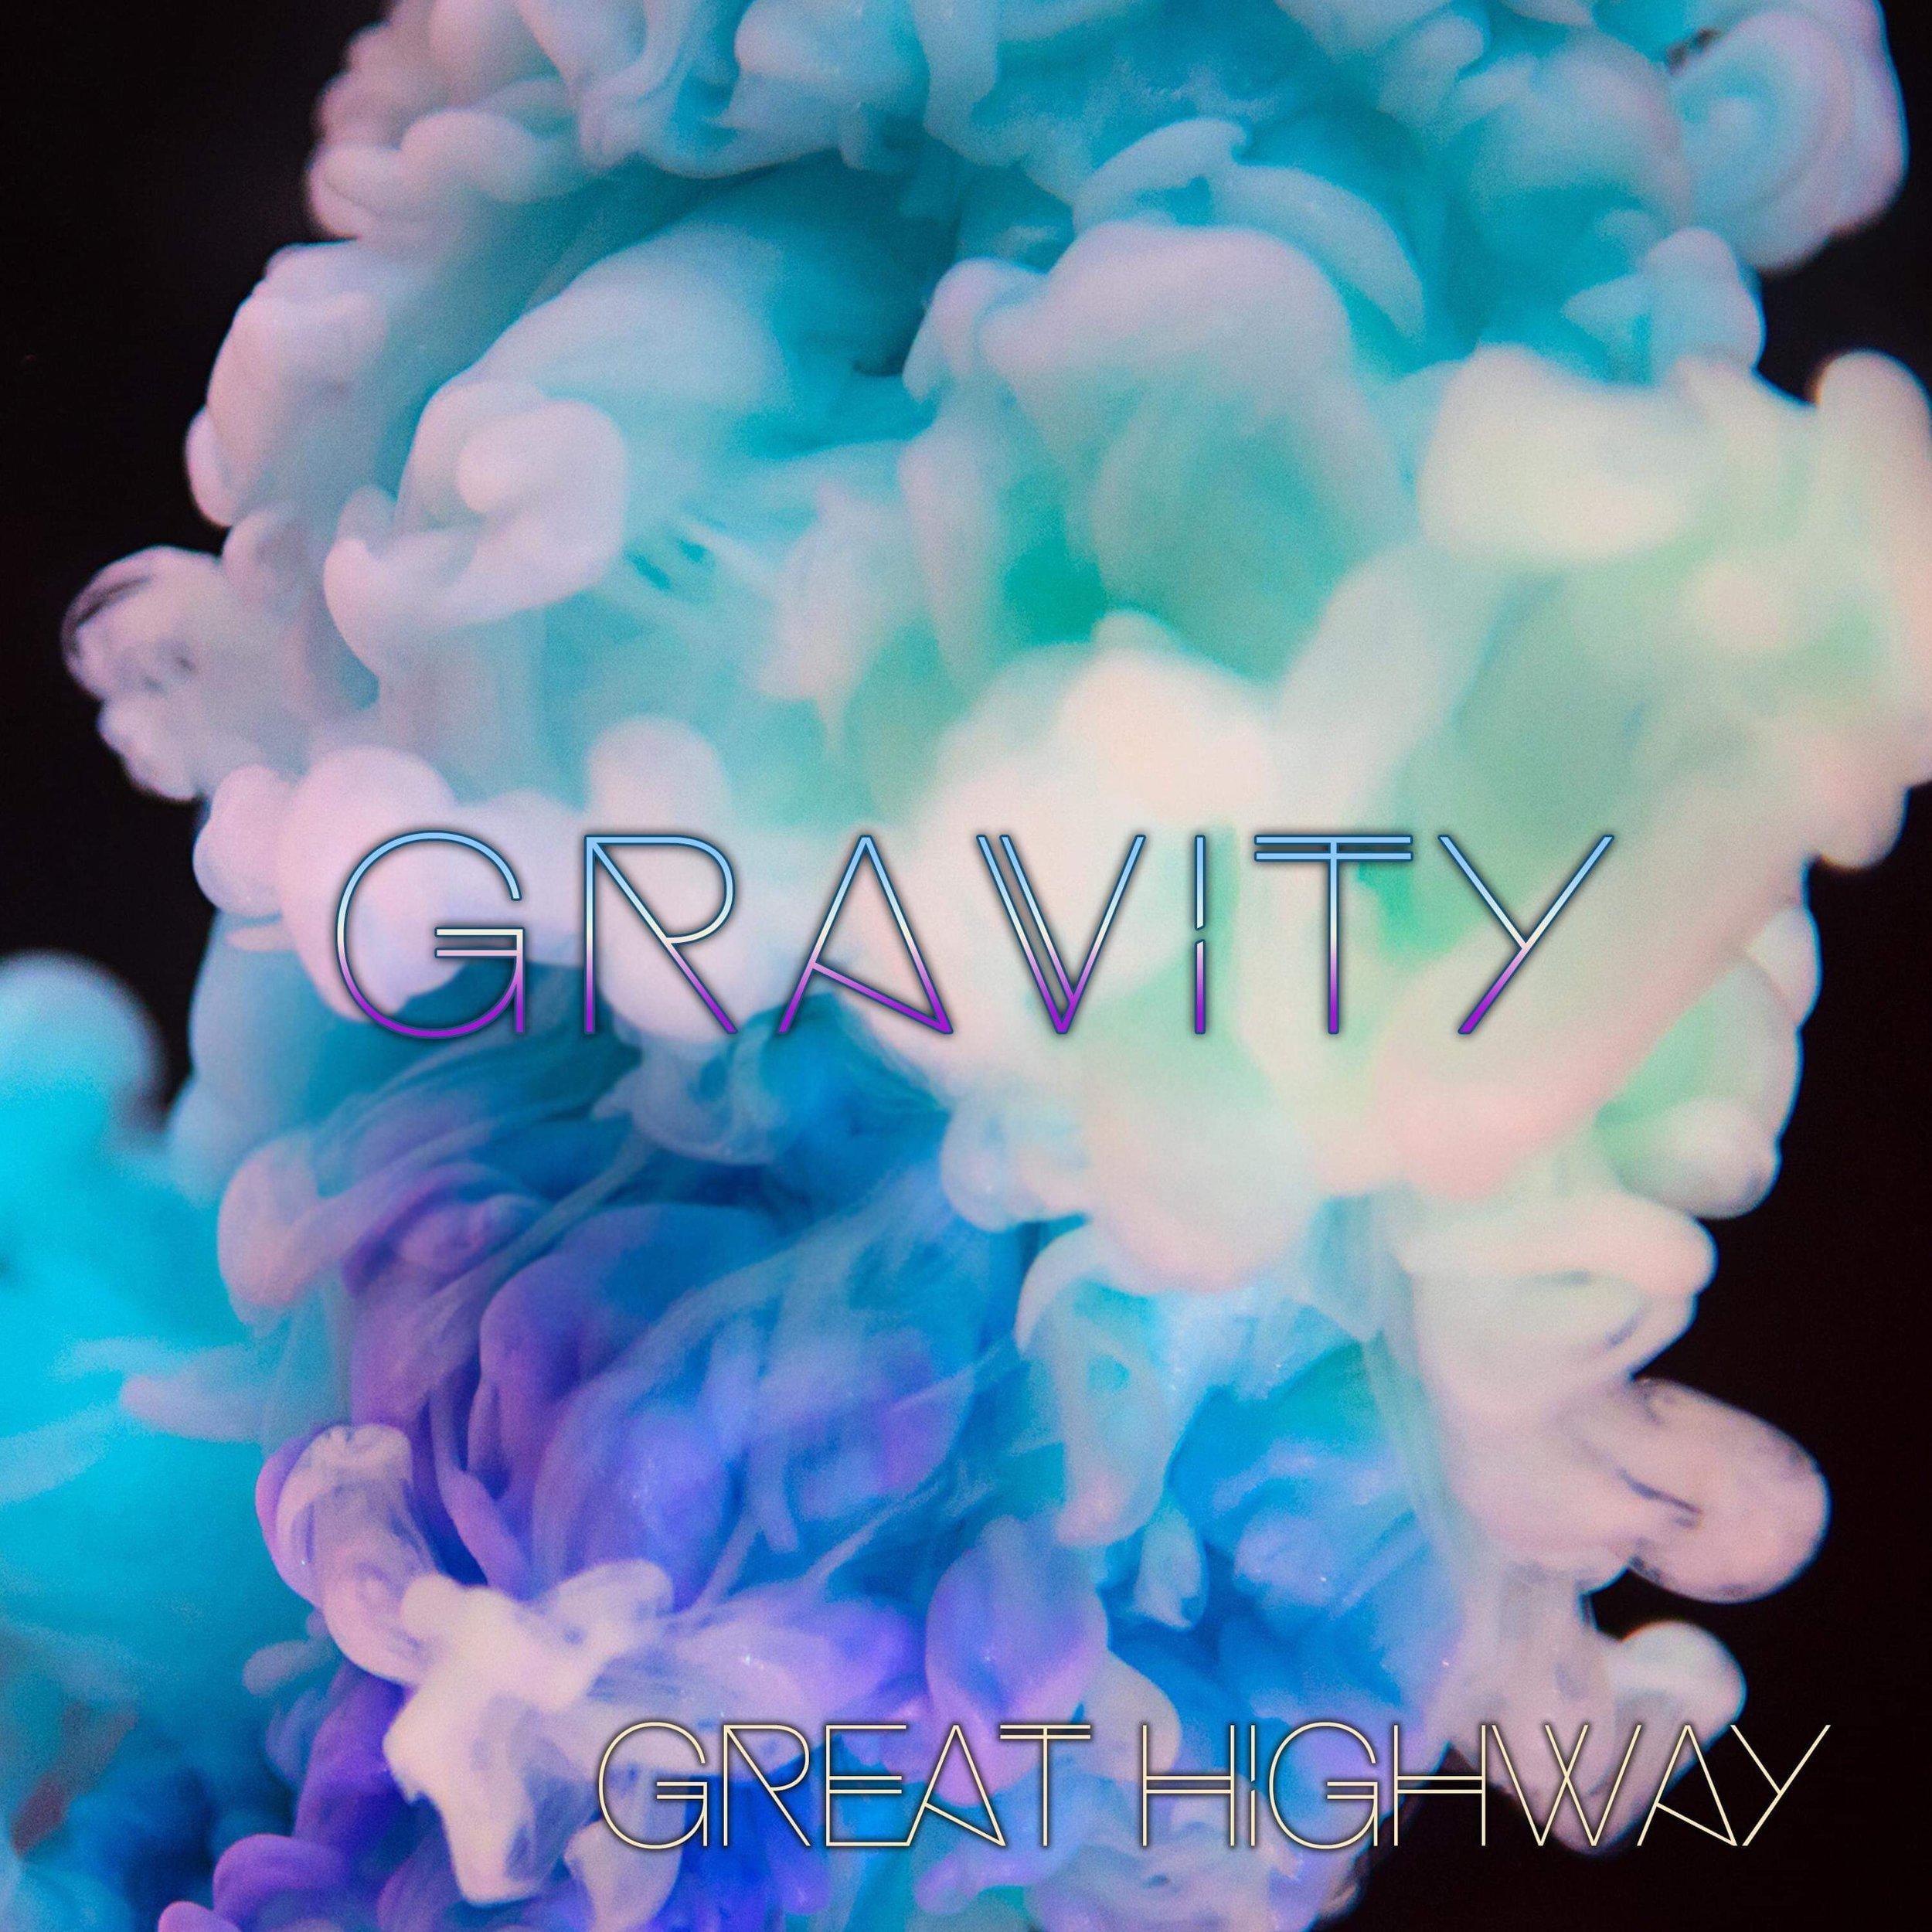 Gravity (1).jpg